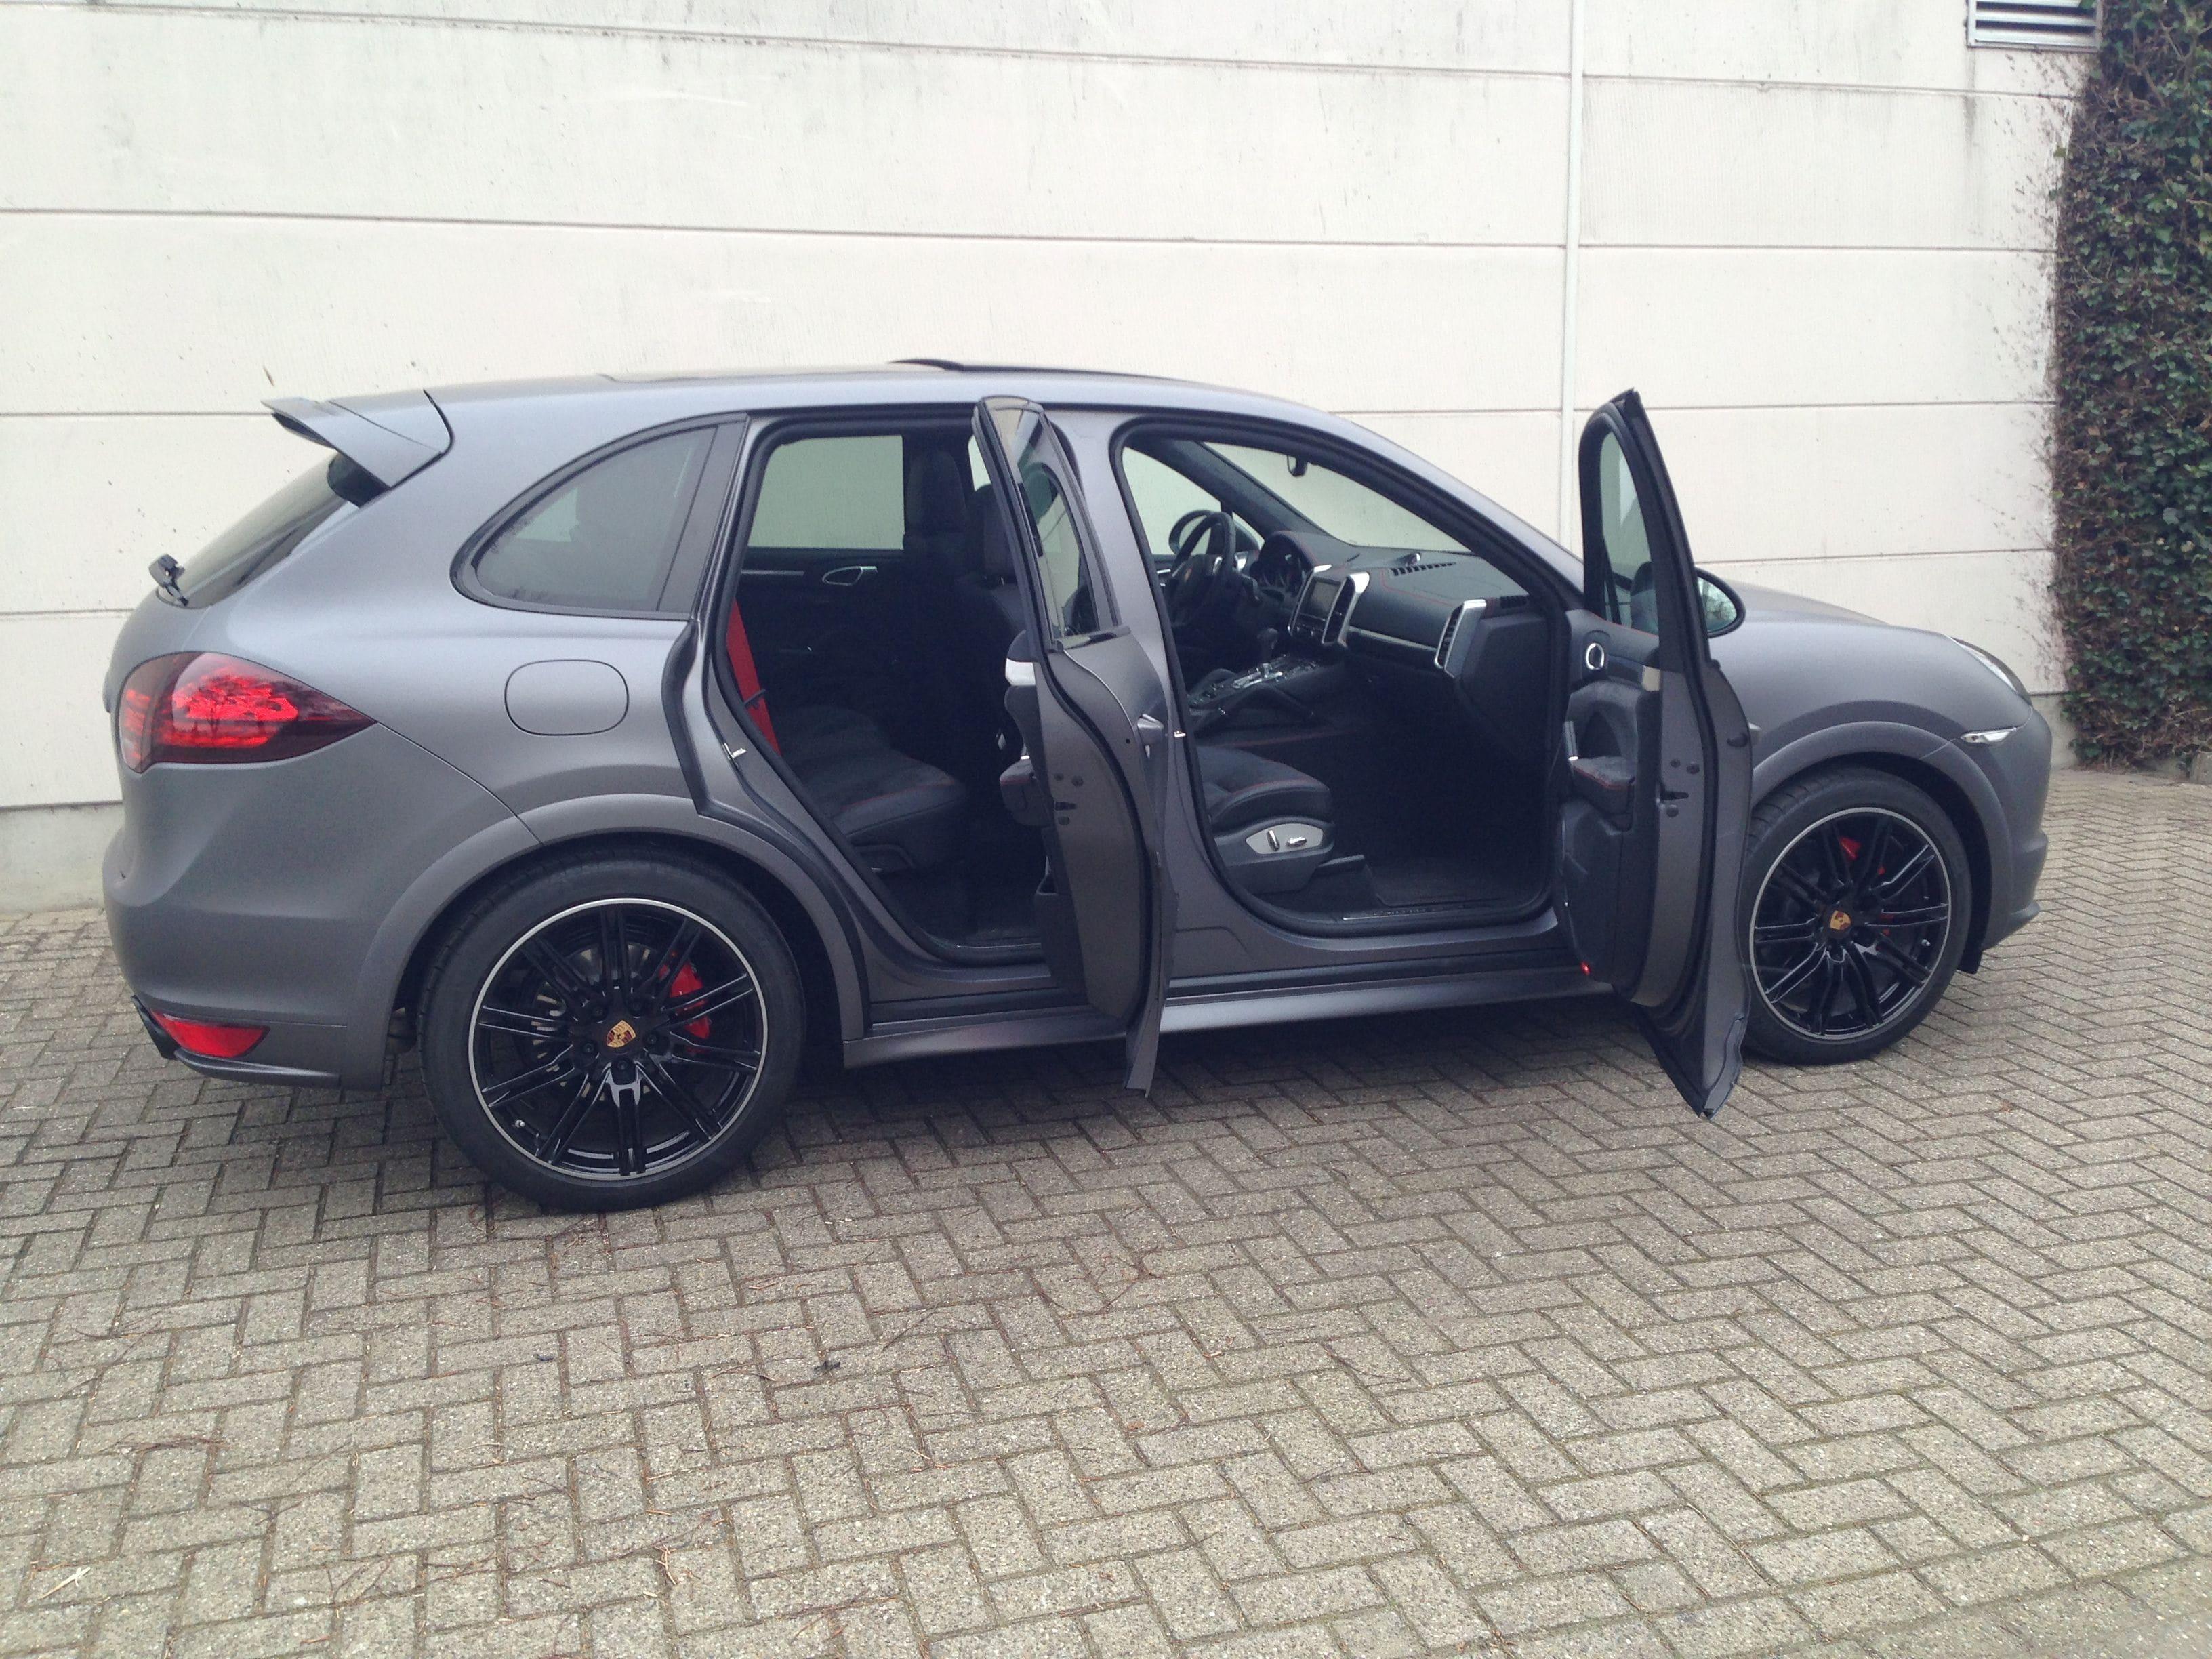 Porsche Cayenne GTS met Gunpowder Wrap, Carwrapping door Wrapmyride.nu Foto-nr:6787, ©2020